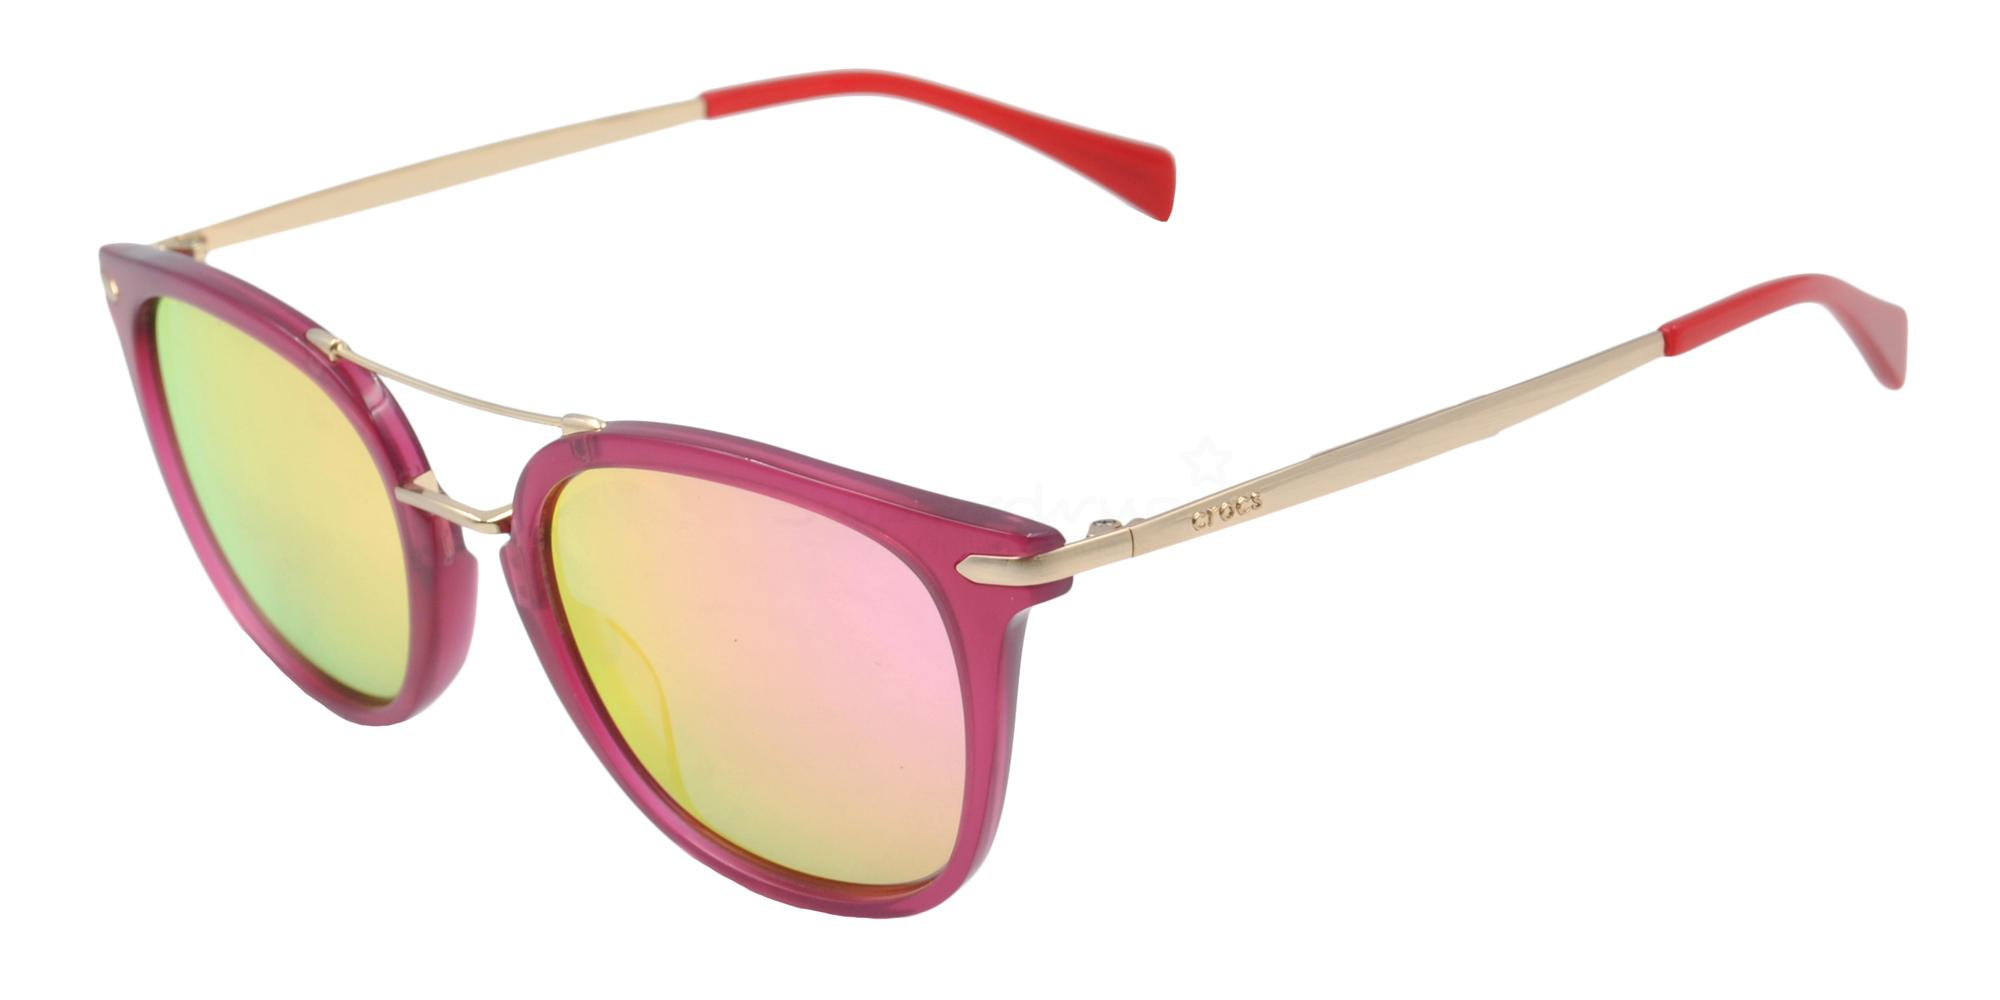 15GD CS045 Sunglasses, Crocs Eyewear